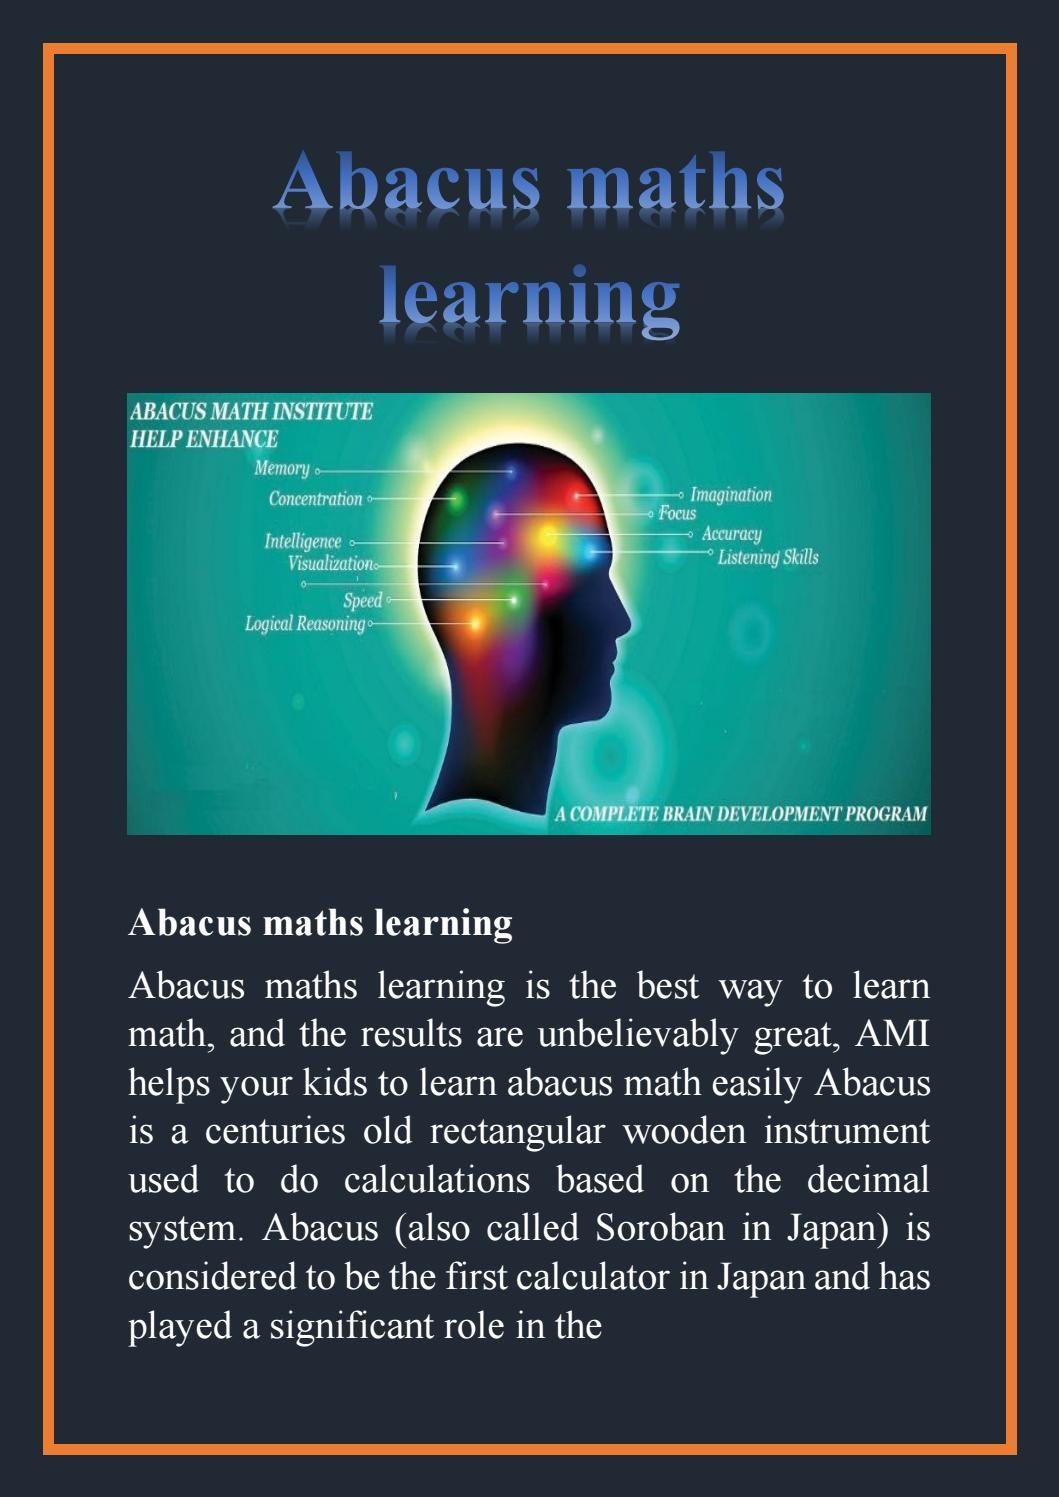 Abacus maths learning | Abacus math, Math and Learn math